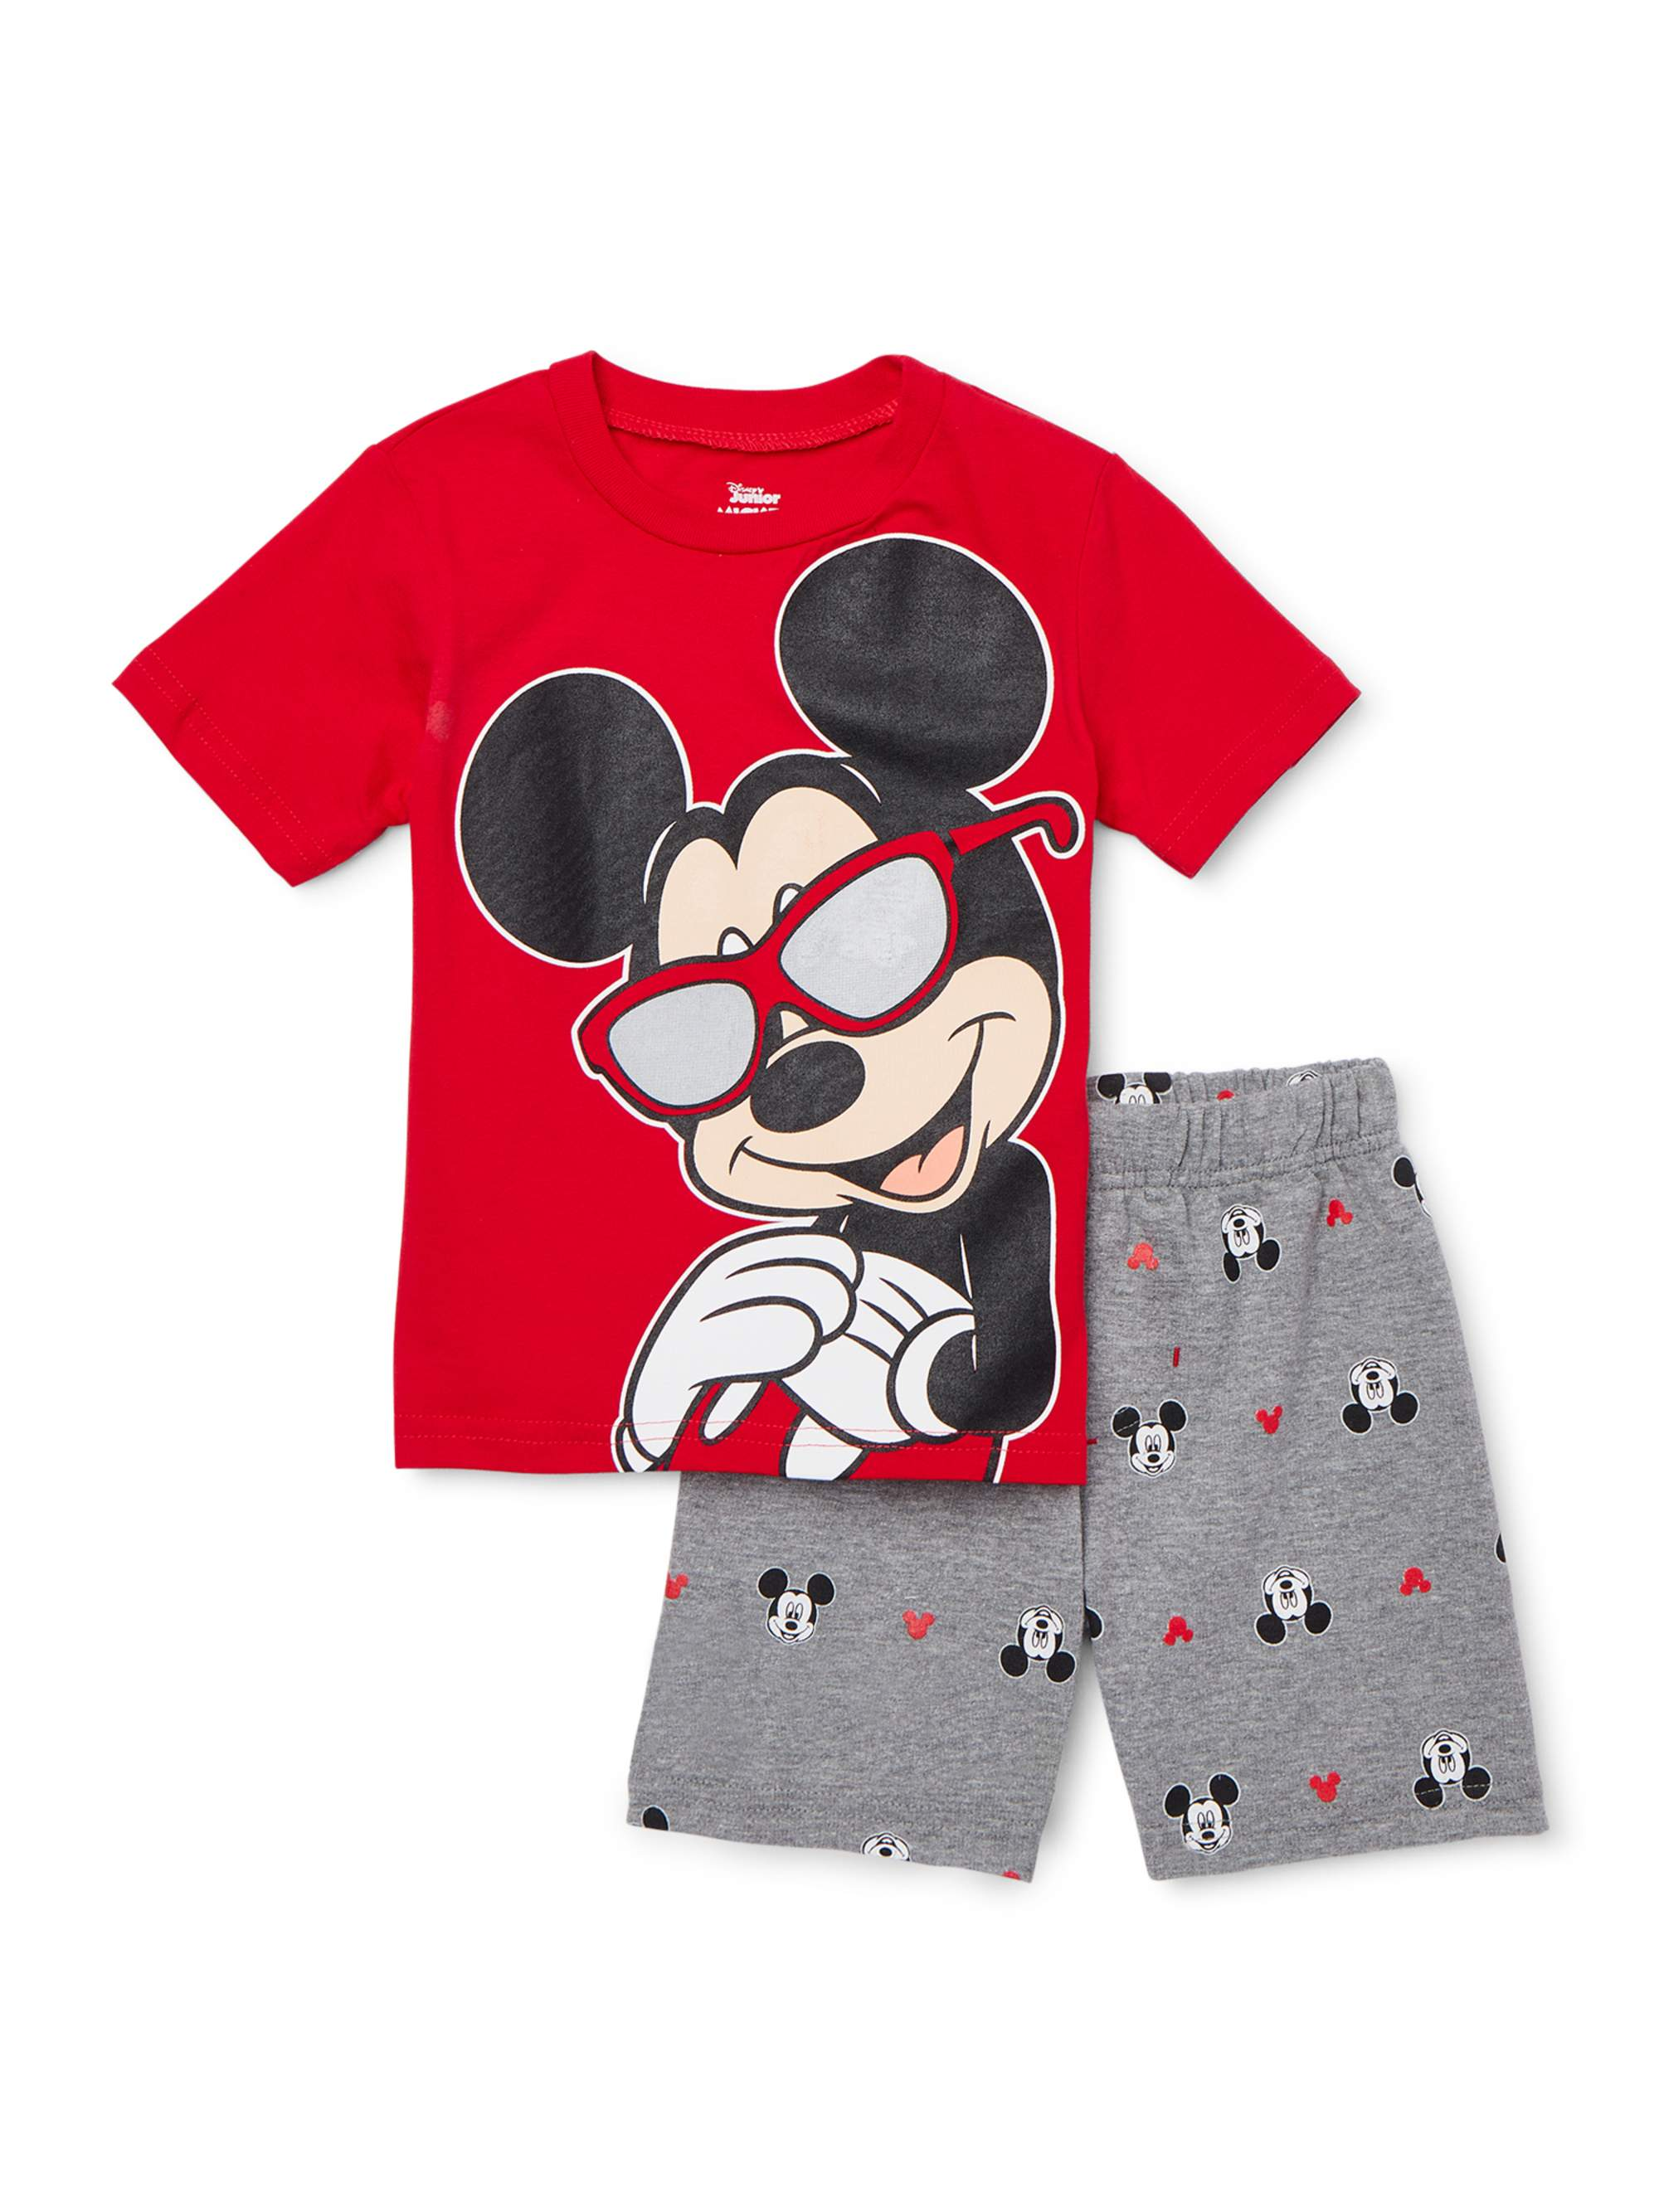 Mickey Mouse Baby Boys 2pc NEW Cartoon Shirt Pants Disney Summer Clothes Set 3T